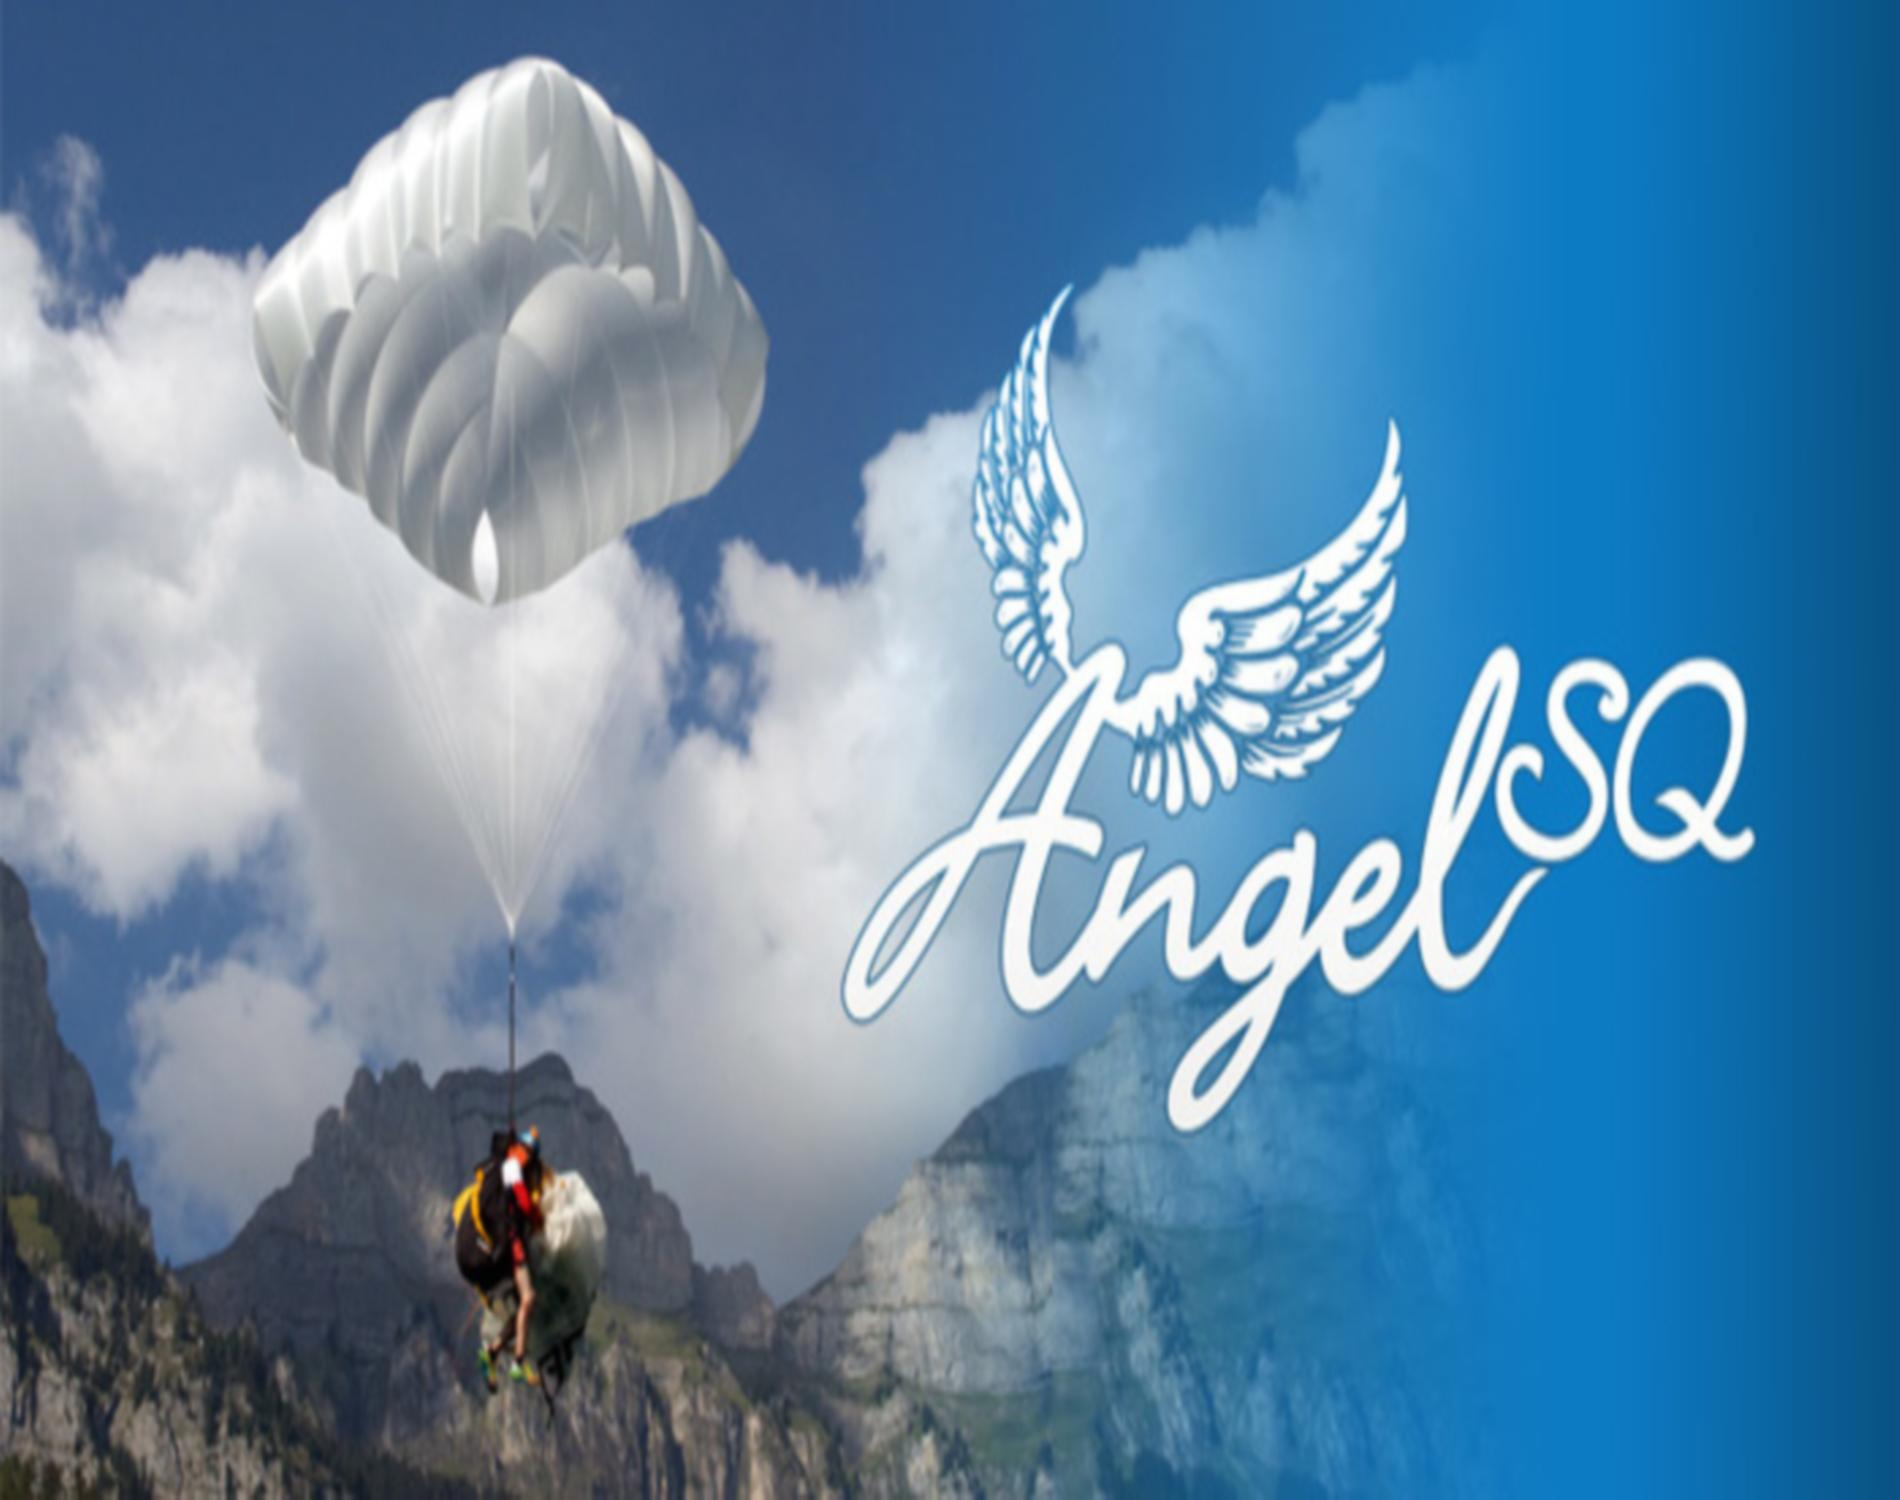 Ozone Oxygen 2 + & Ozone Angel Sq 100